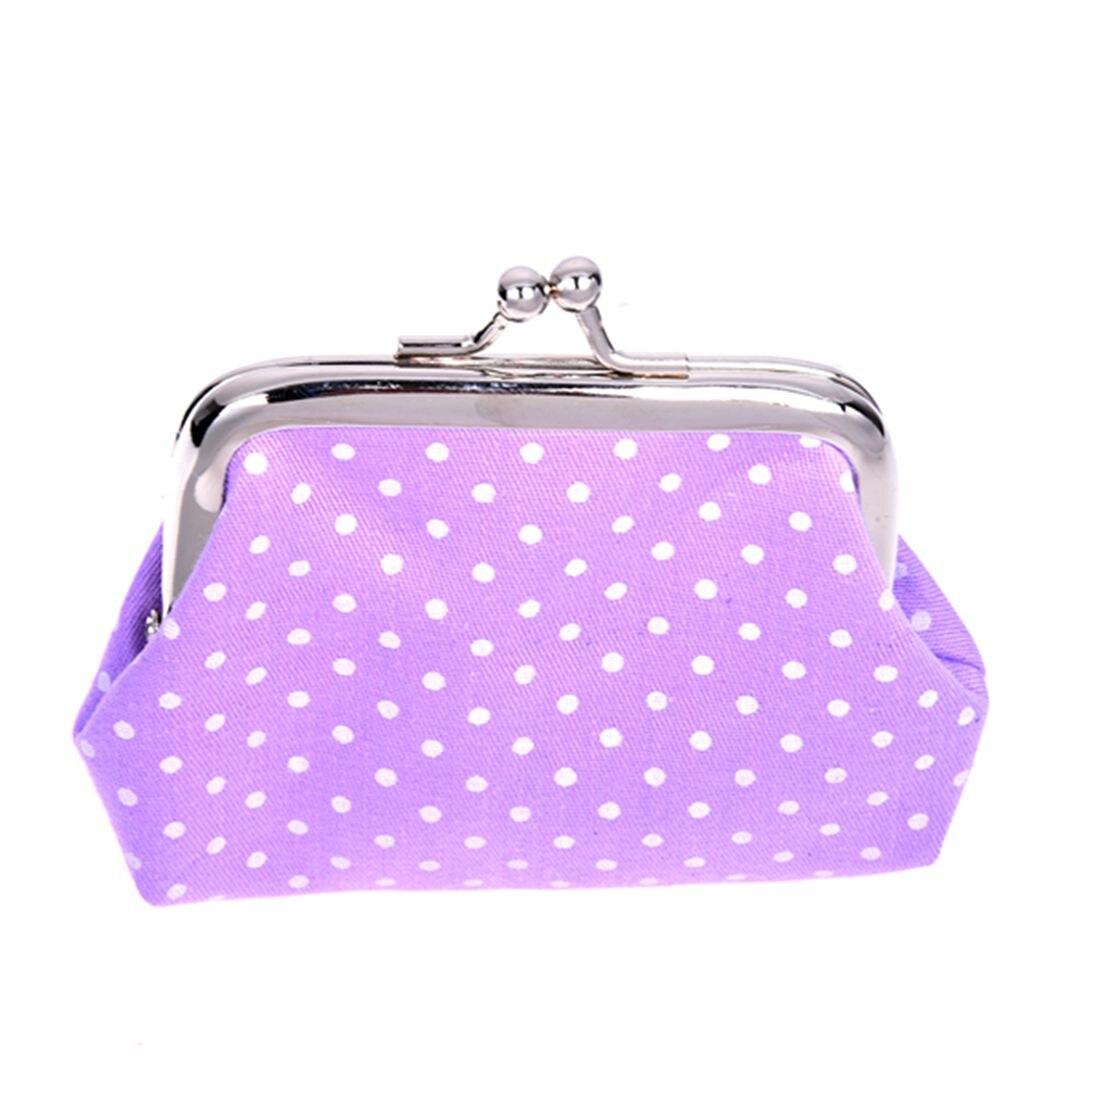 Popular Cute girls Wallet Clutch Change Purse key/coins bag Mini Handbag Pouch purple